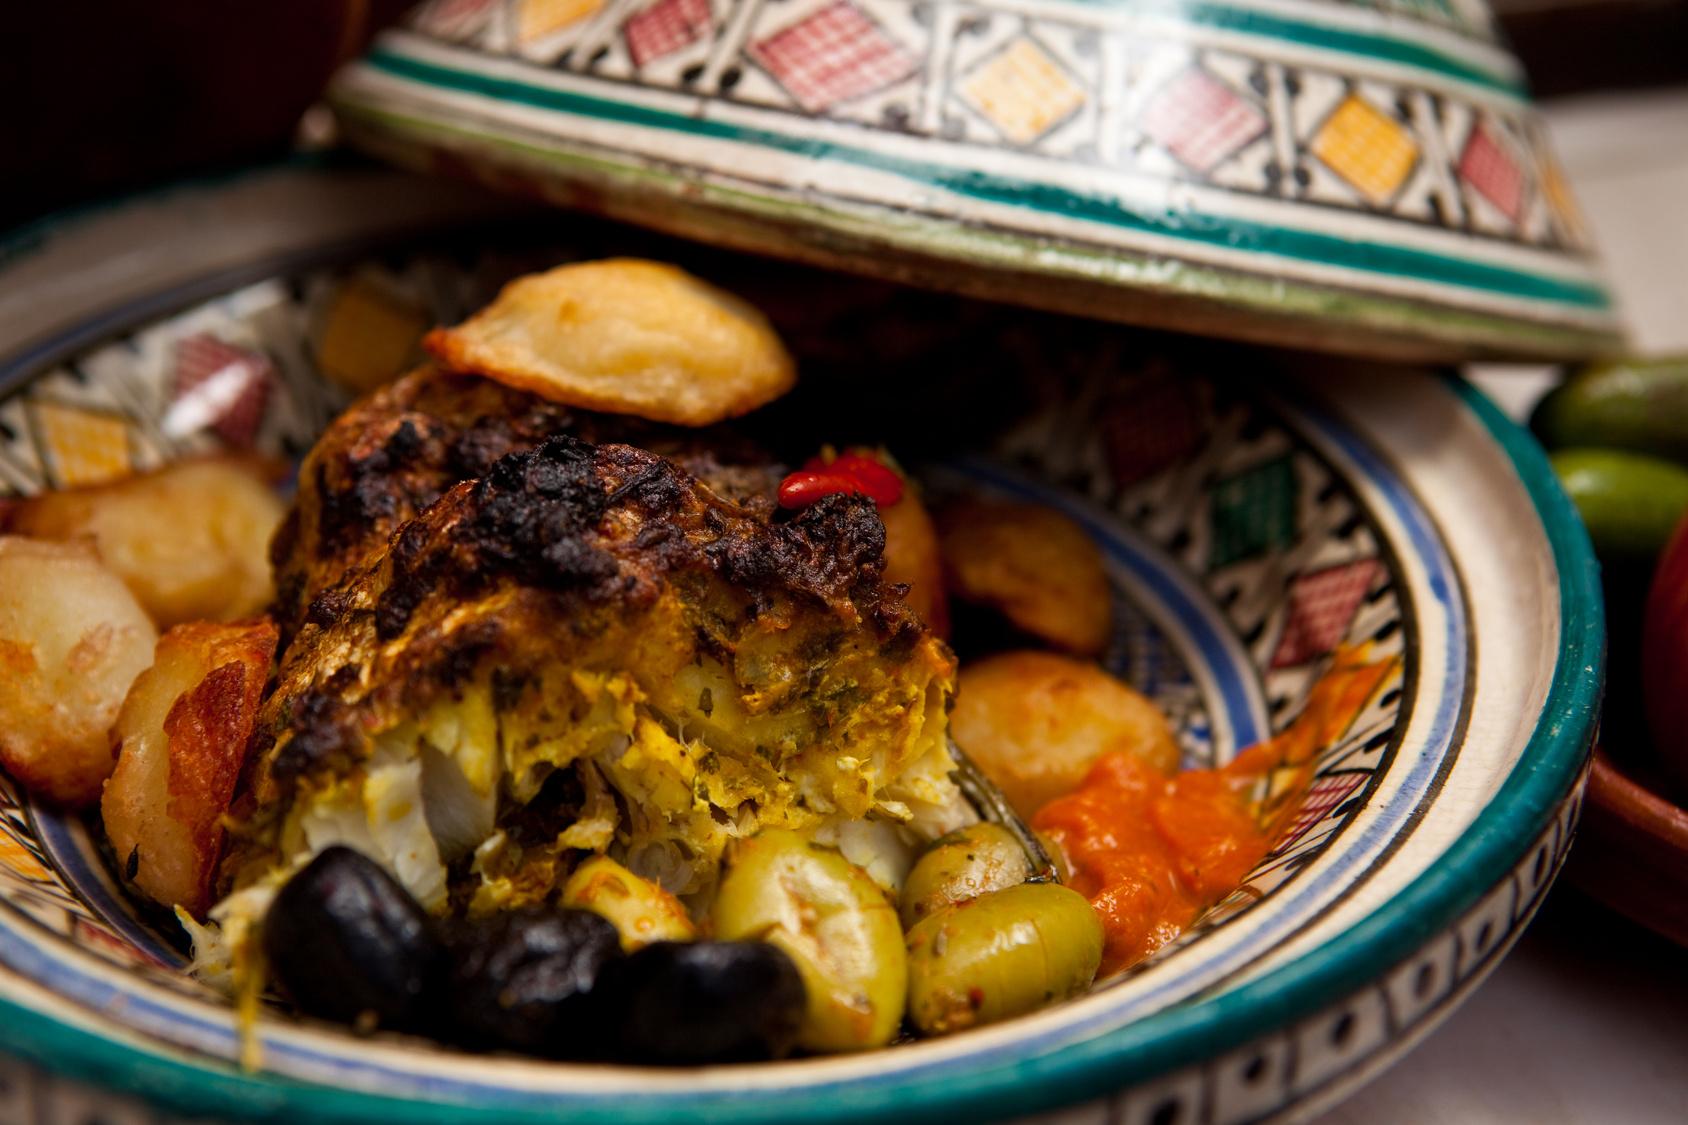 Maroko patiekalai